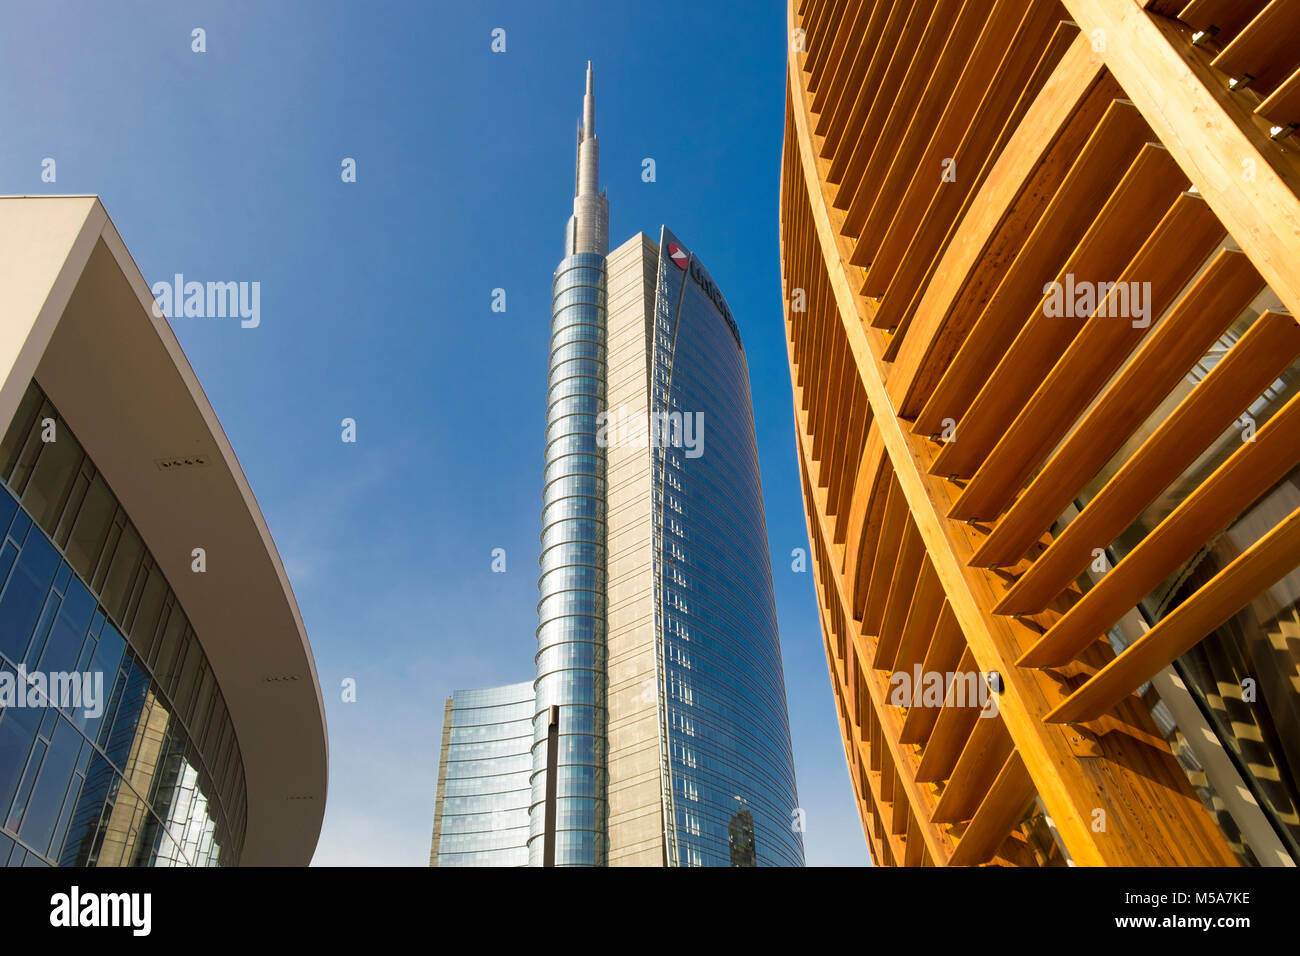 Moderne Architektur - UniCredit Turm Torre UniCredit an der Porta Nuova business district, Mailand, Italien, mit Stockbild